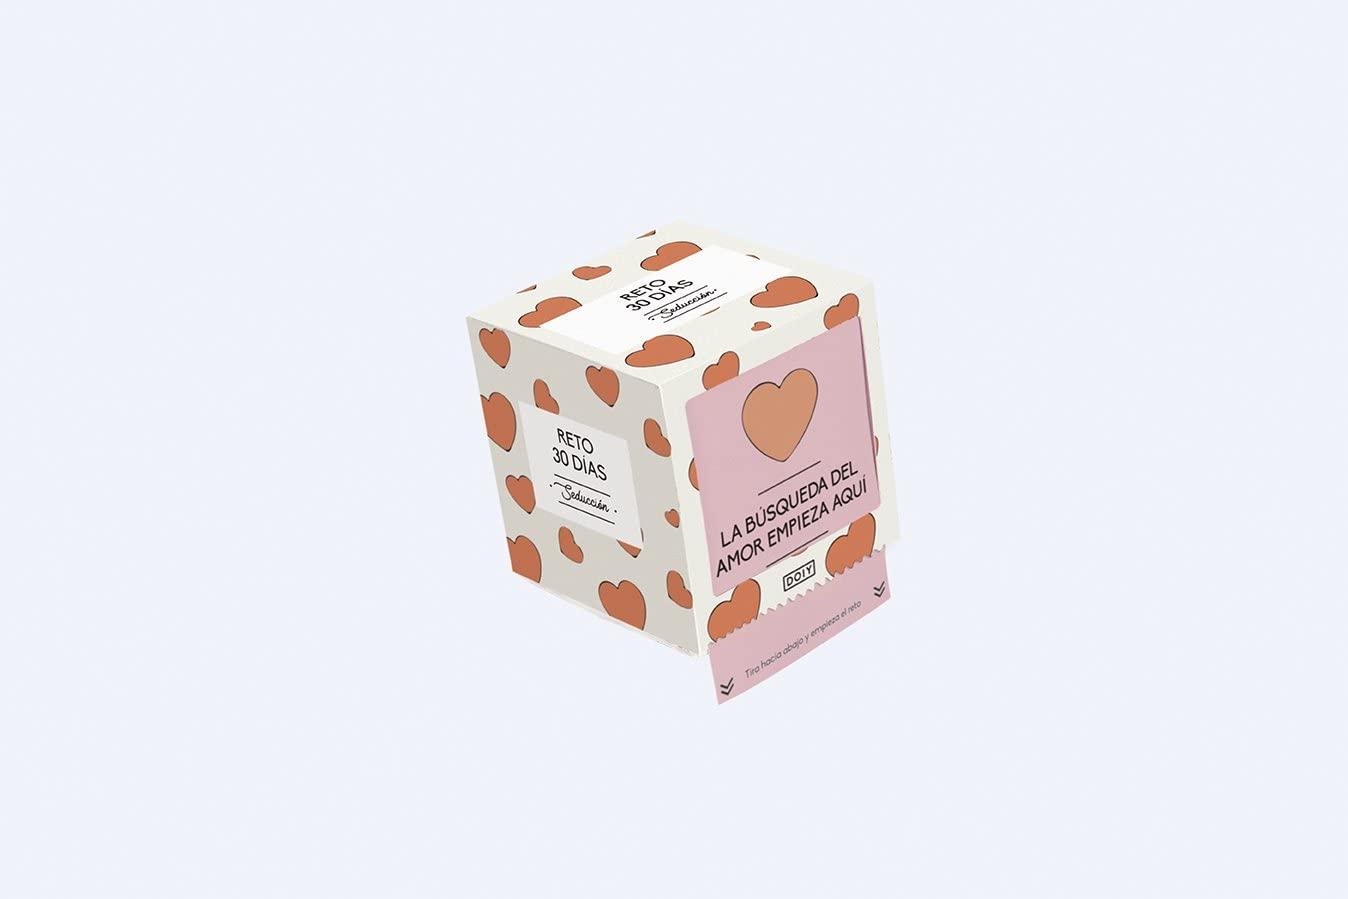 30 Day Seduction Challenge Cube (Spanish) Reto en 30 días